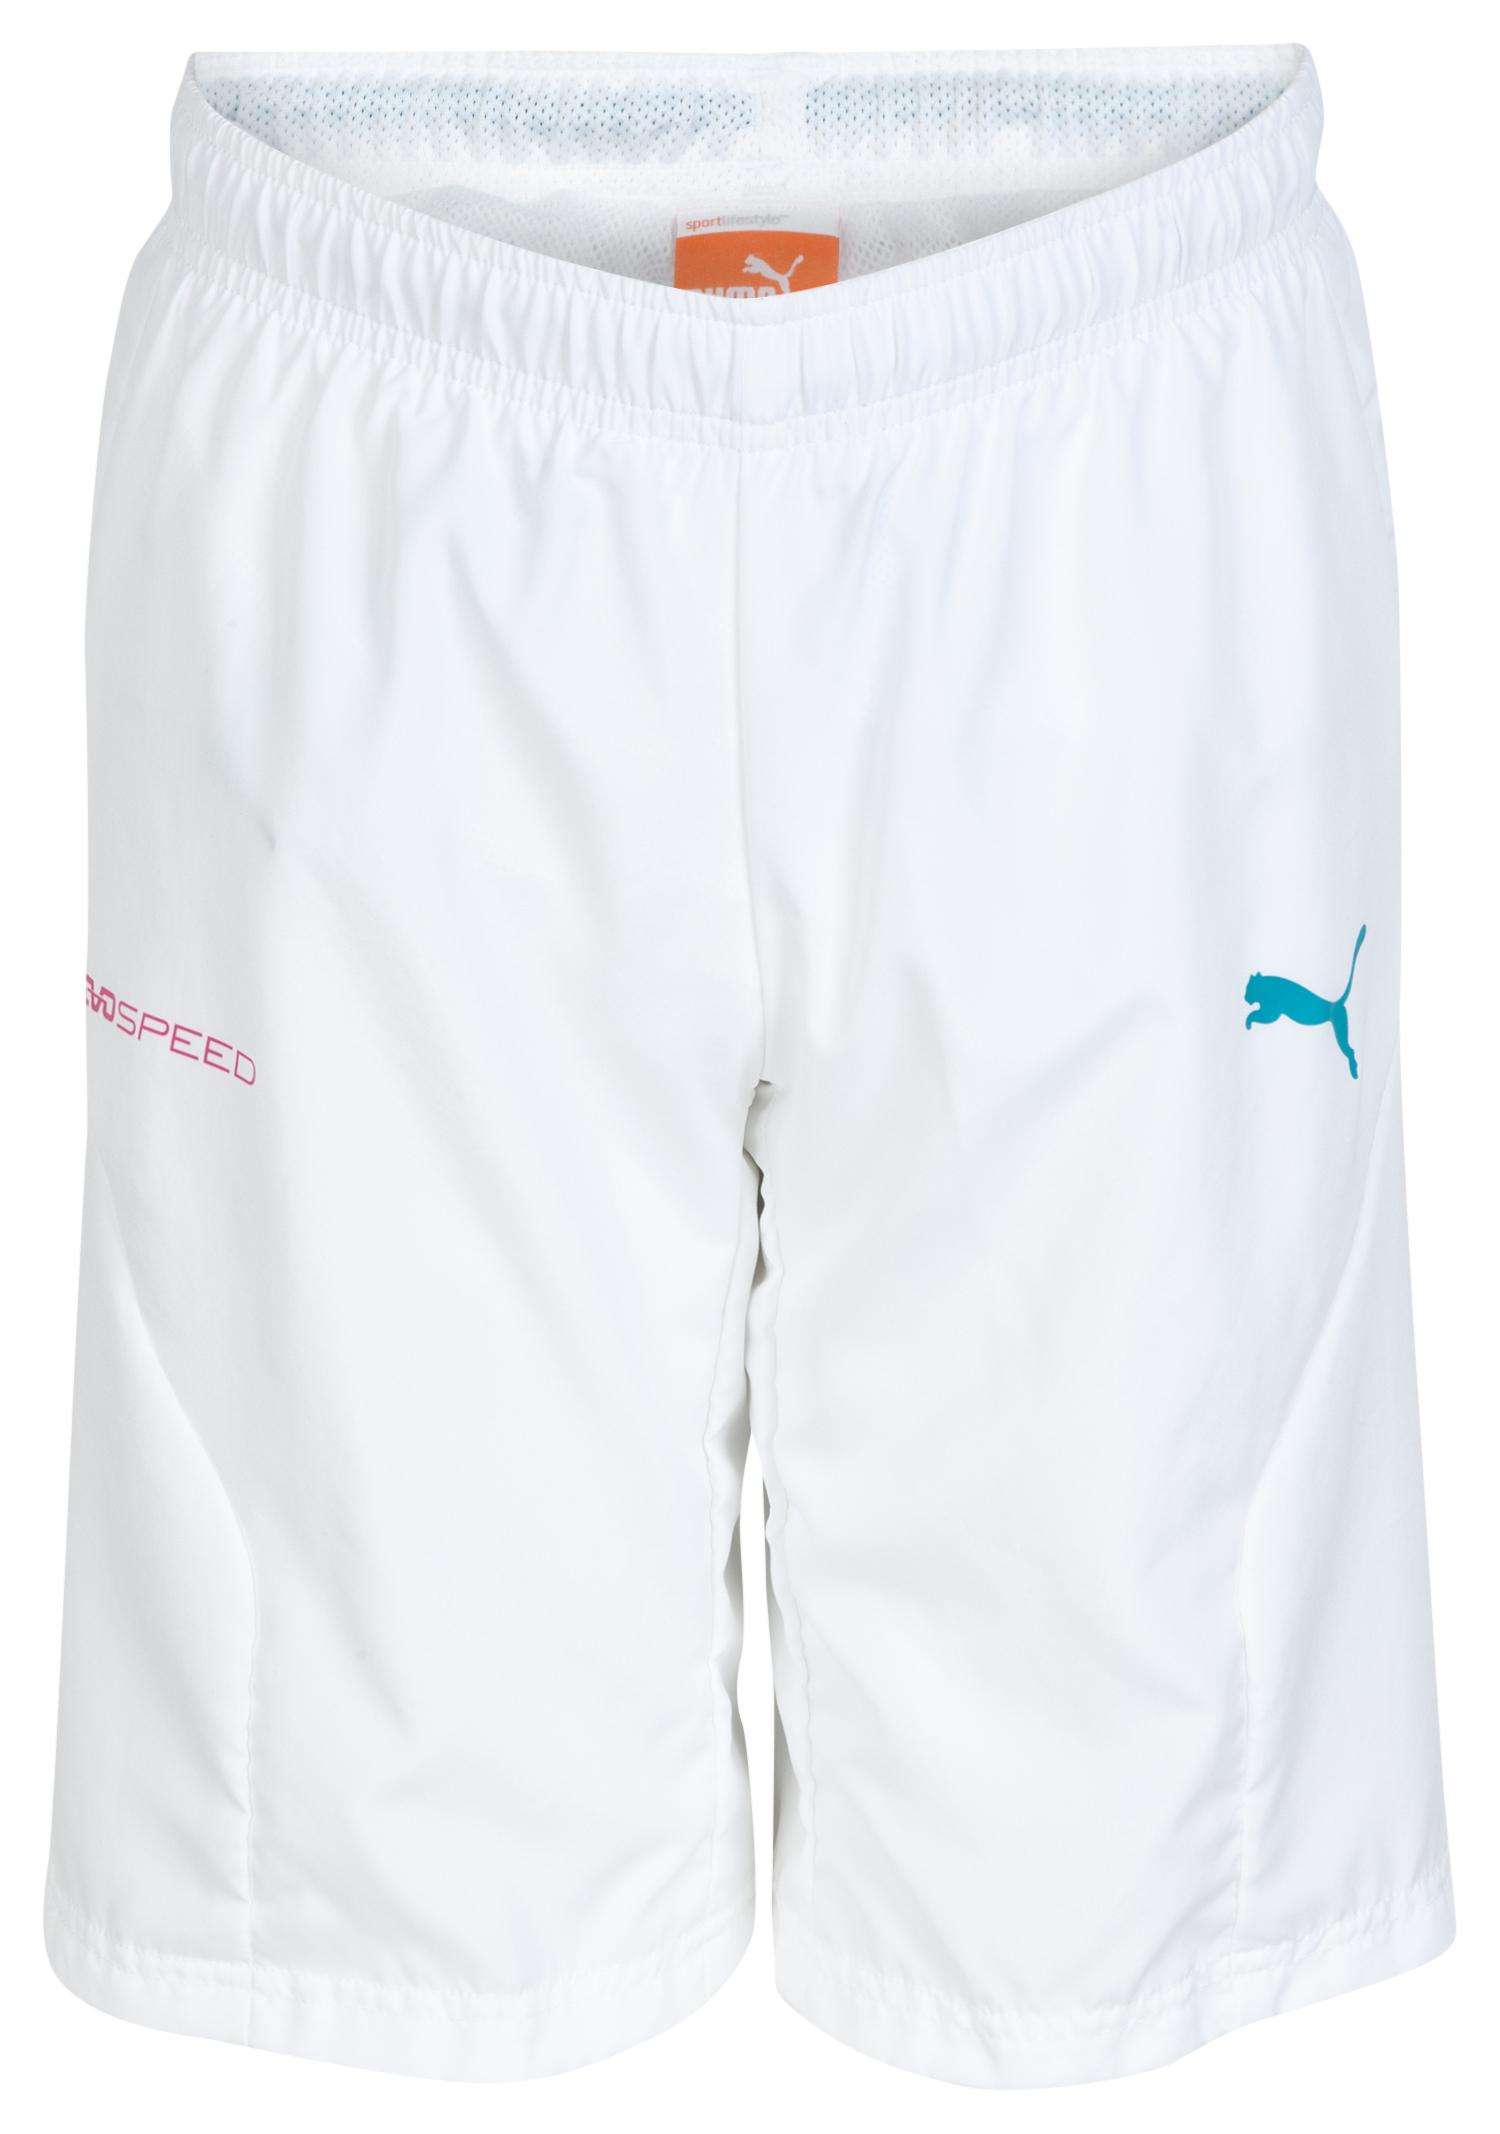 Puma evoSPEED TRICKS Woven Shorts